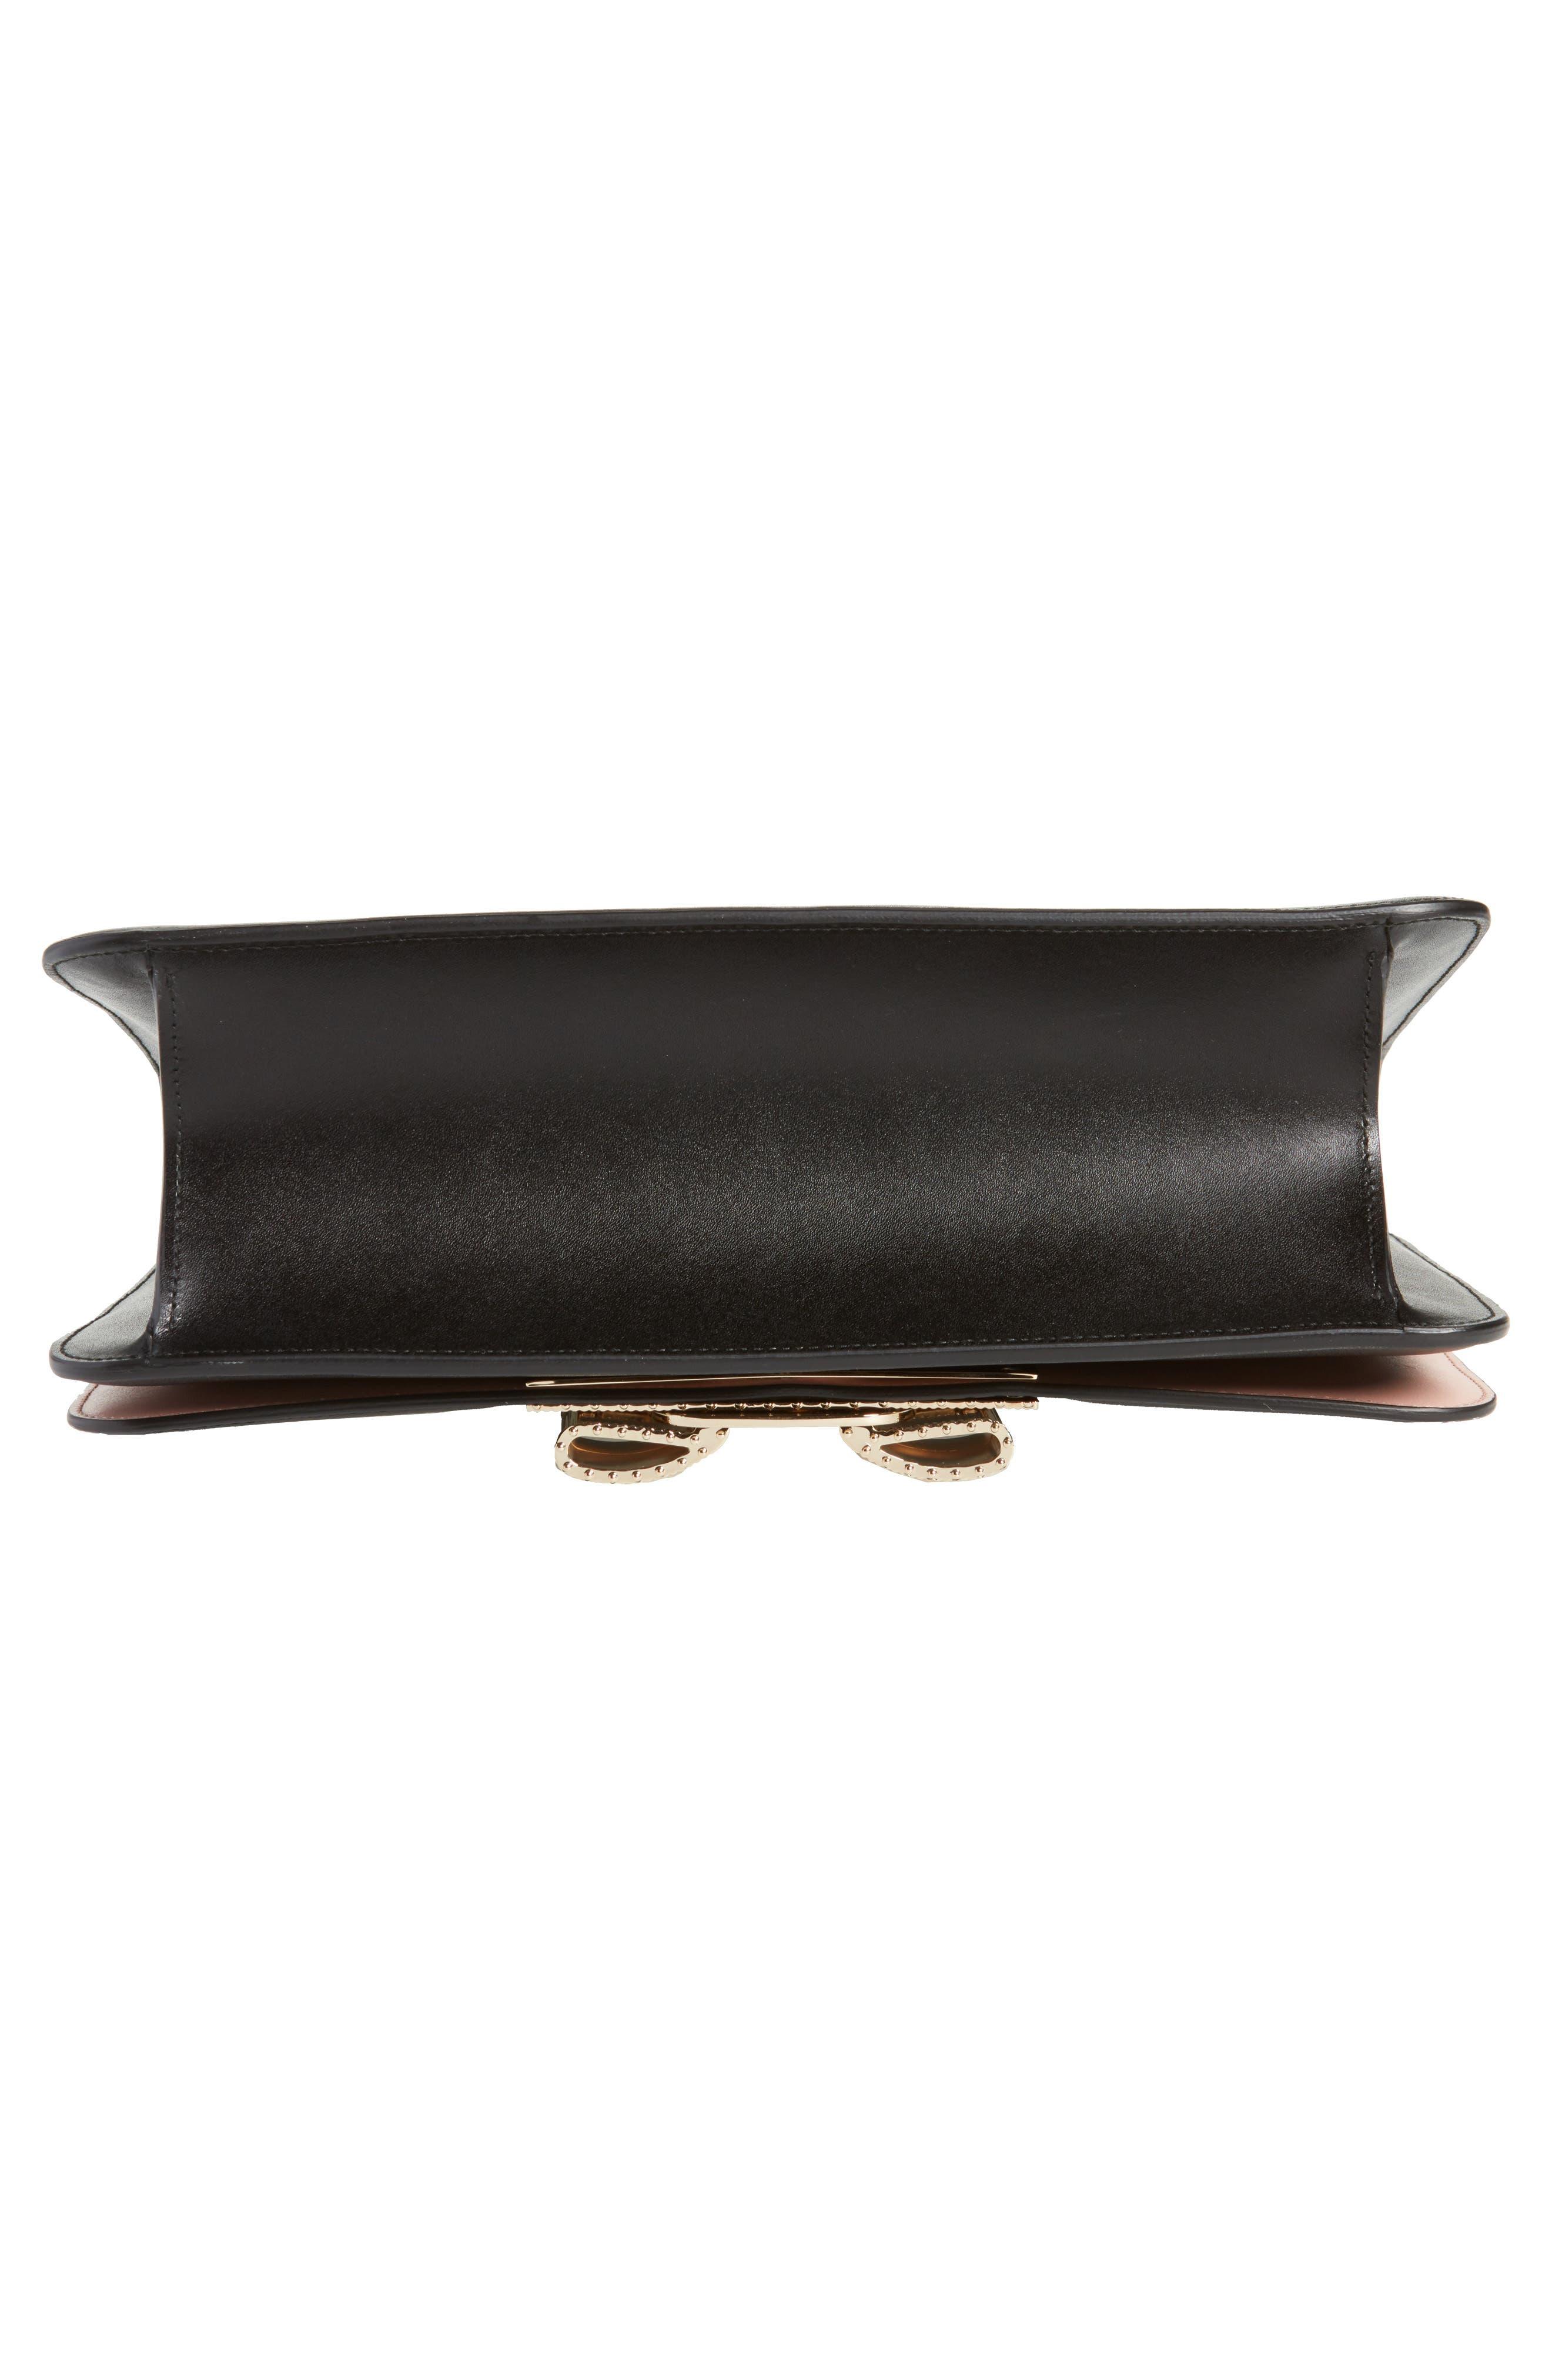 Vara Leather Shoulder Bag,                             Alternate thumbnail 6, color,                             Nero/ Bonbon